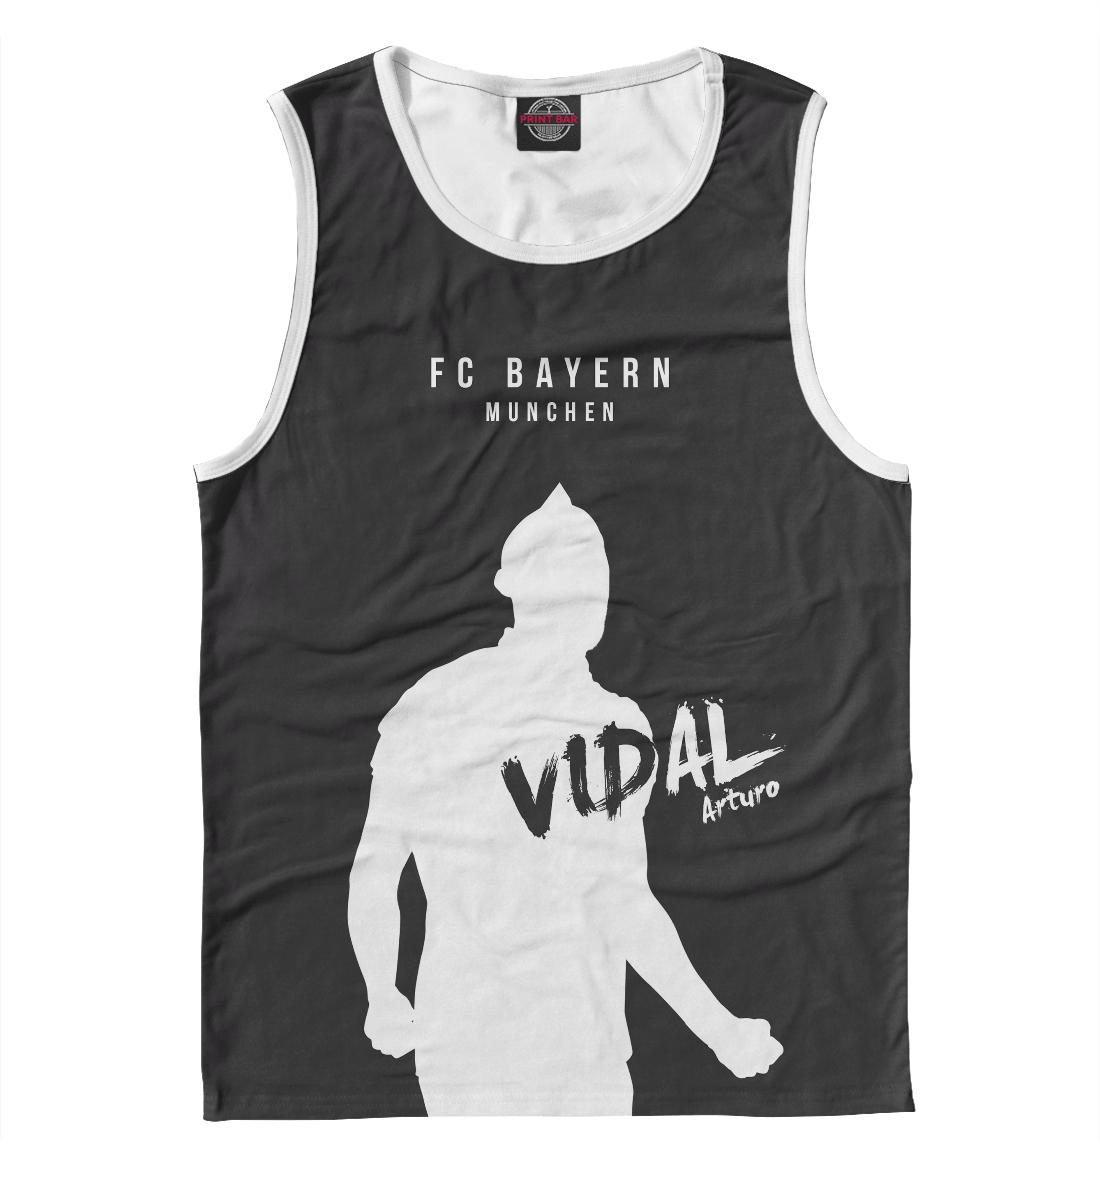 Купить Vidal, Printbar, Майки, BAY-602526-may-2